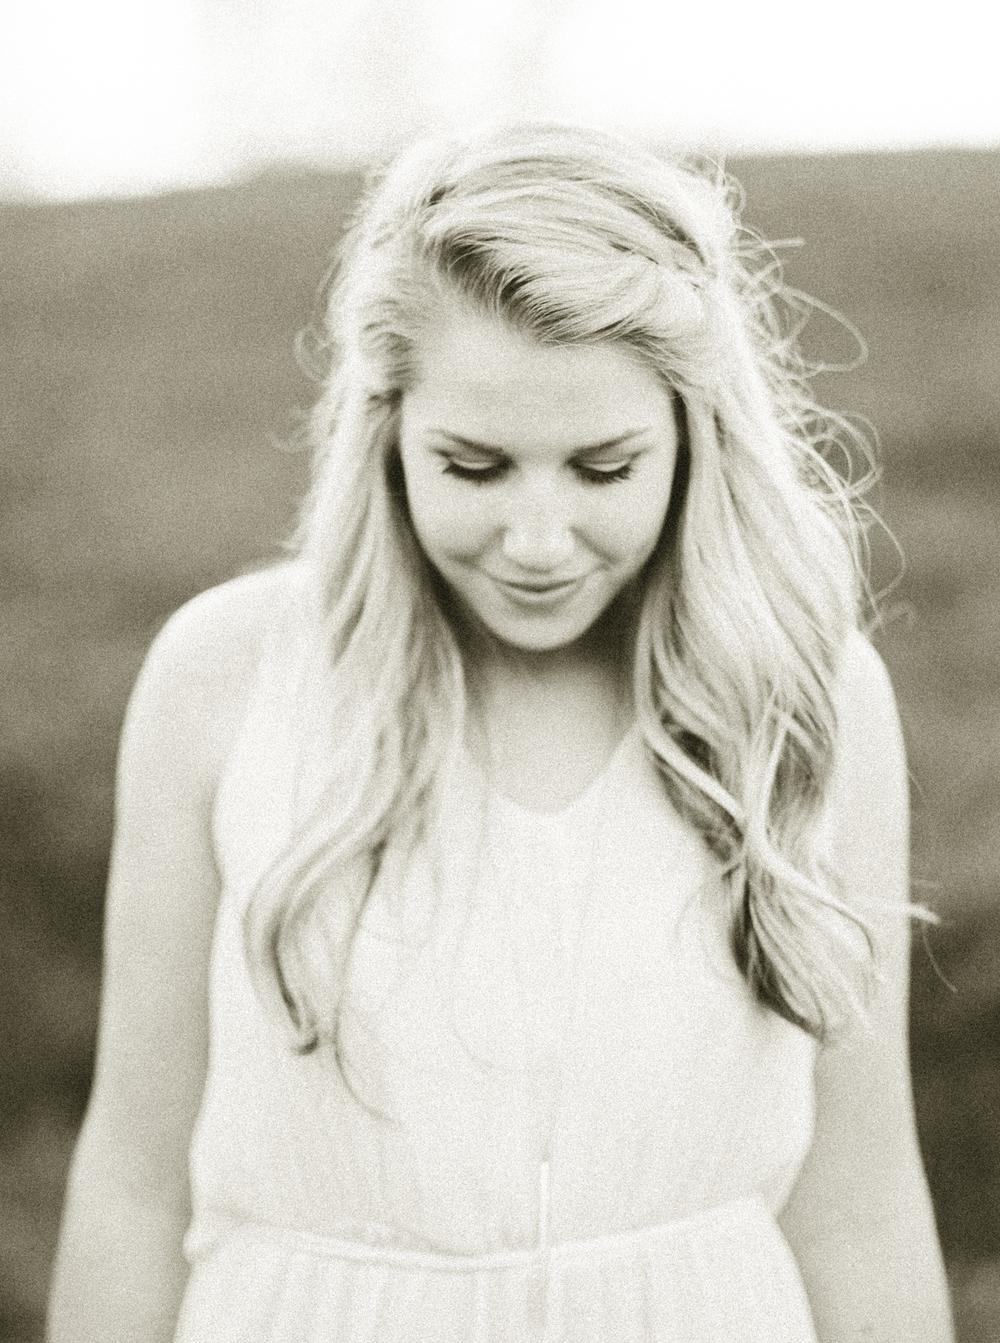 Katie-Nicolle-Niagara-Toronto-Muskoka-Wedding-85.jpg